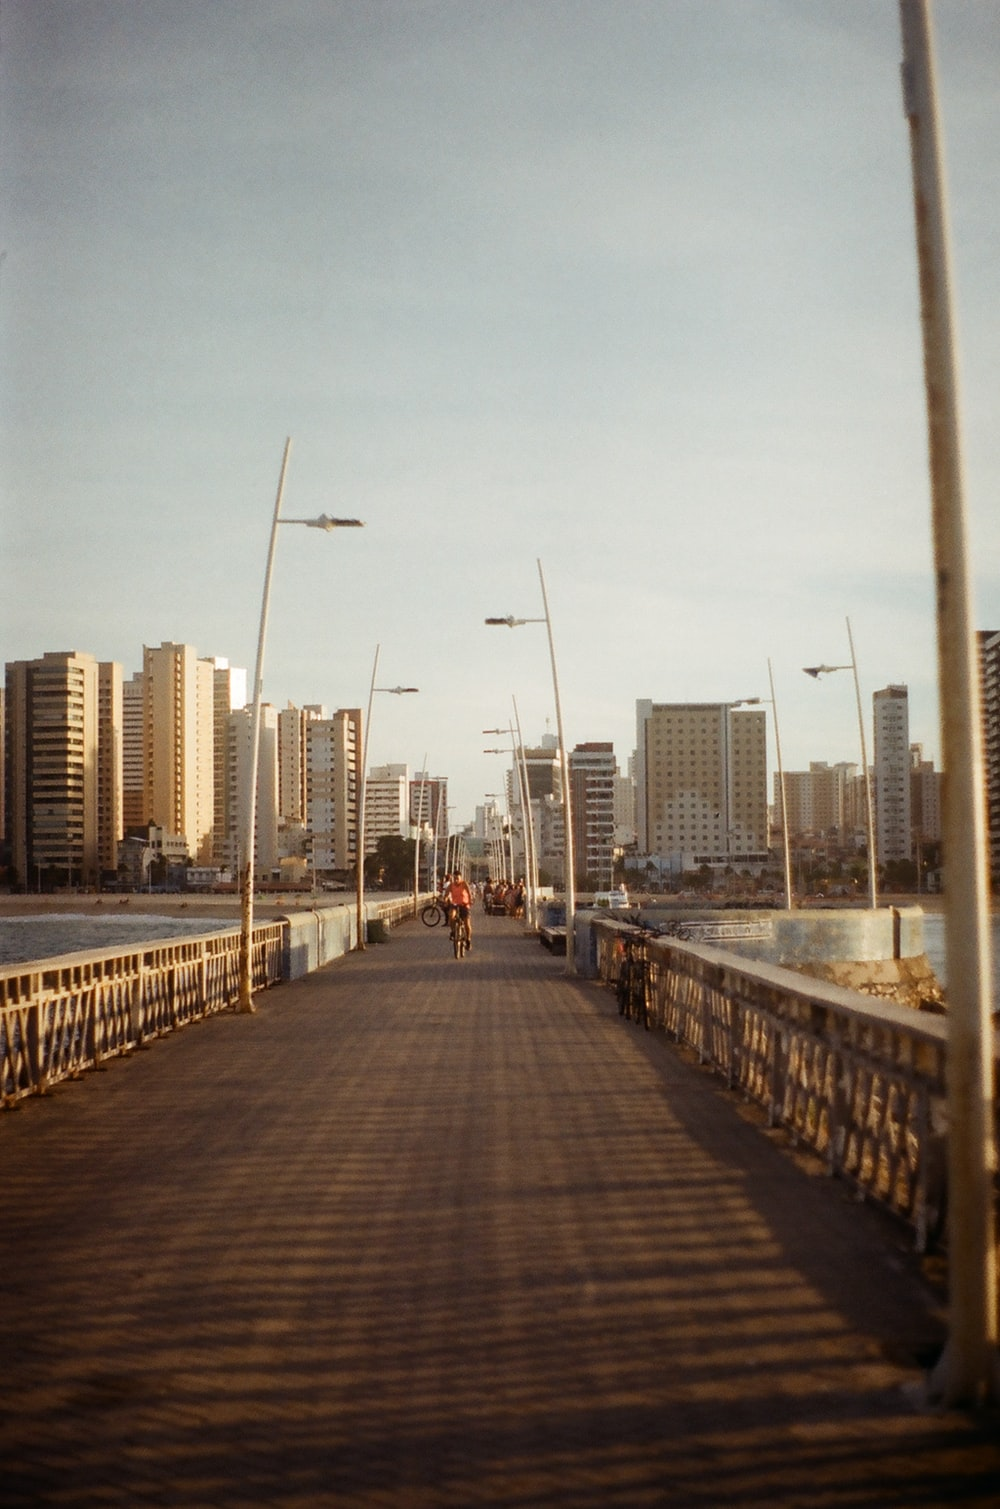 people walking on gray concrete bridge near city buildings during daytime